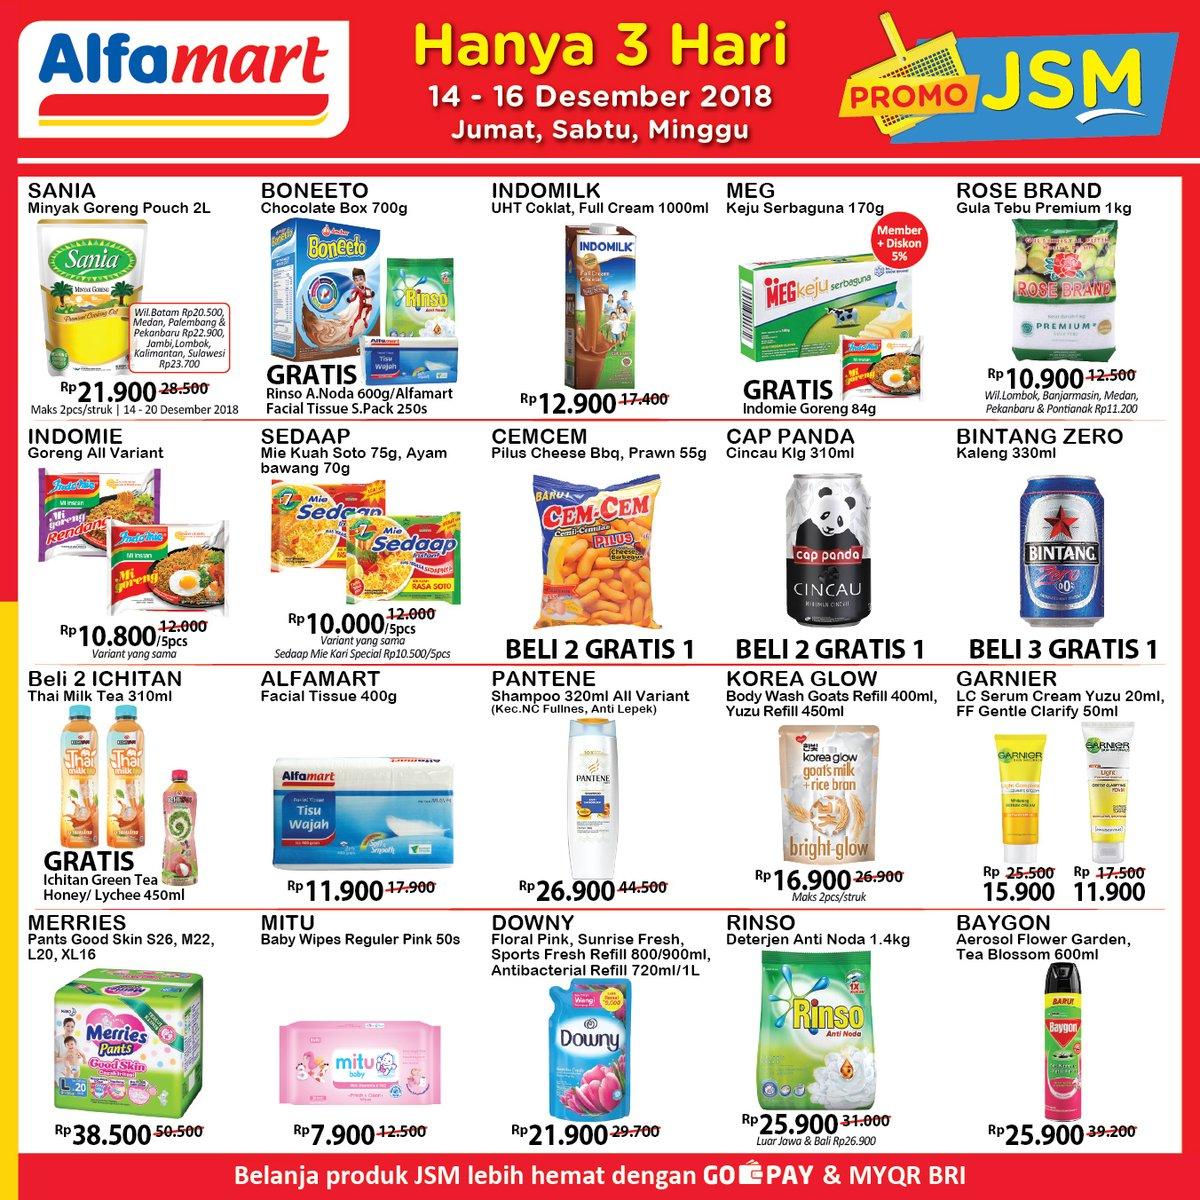 Alfamart - Promo Katalog JSM Periode 14 - 16 Desember 2018